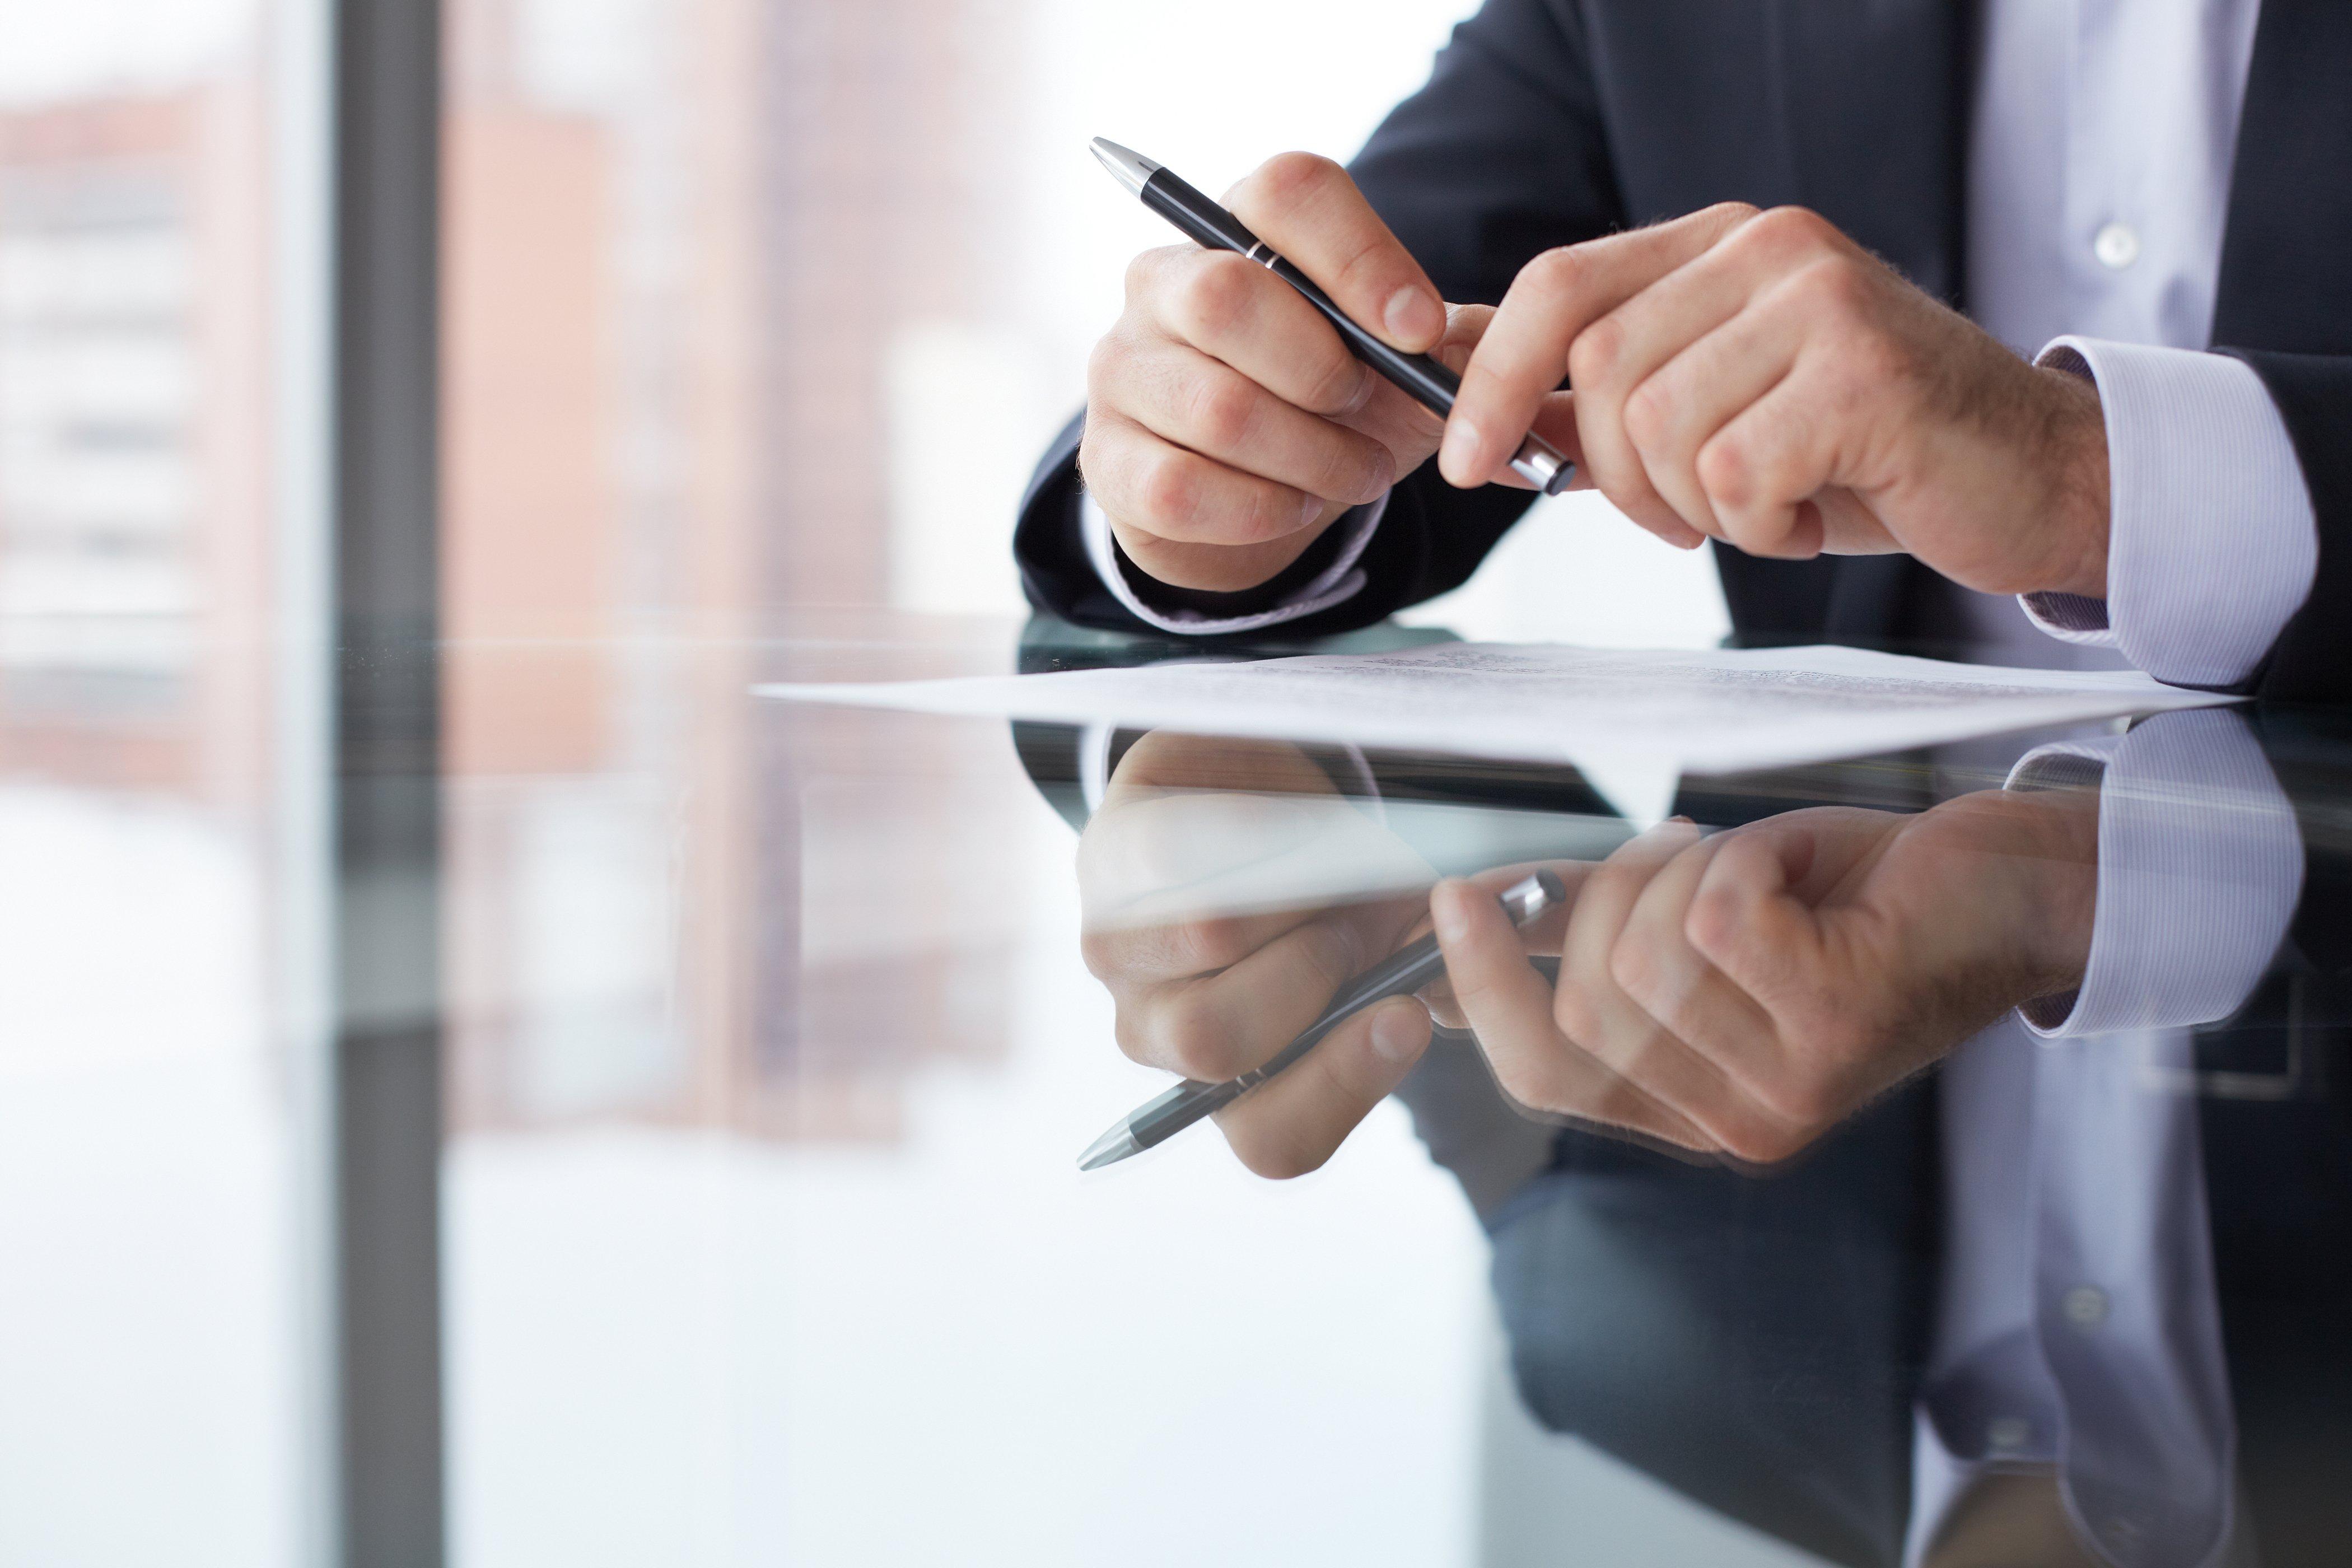 hands-pen-paper-table